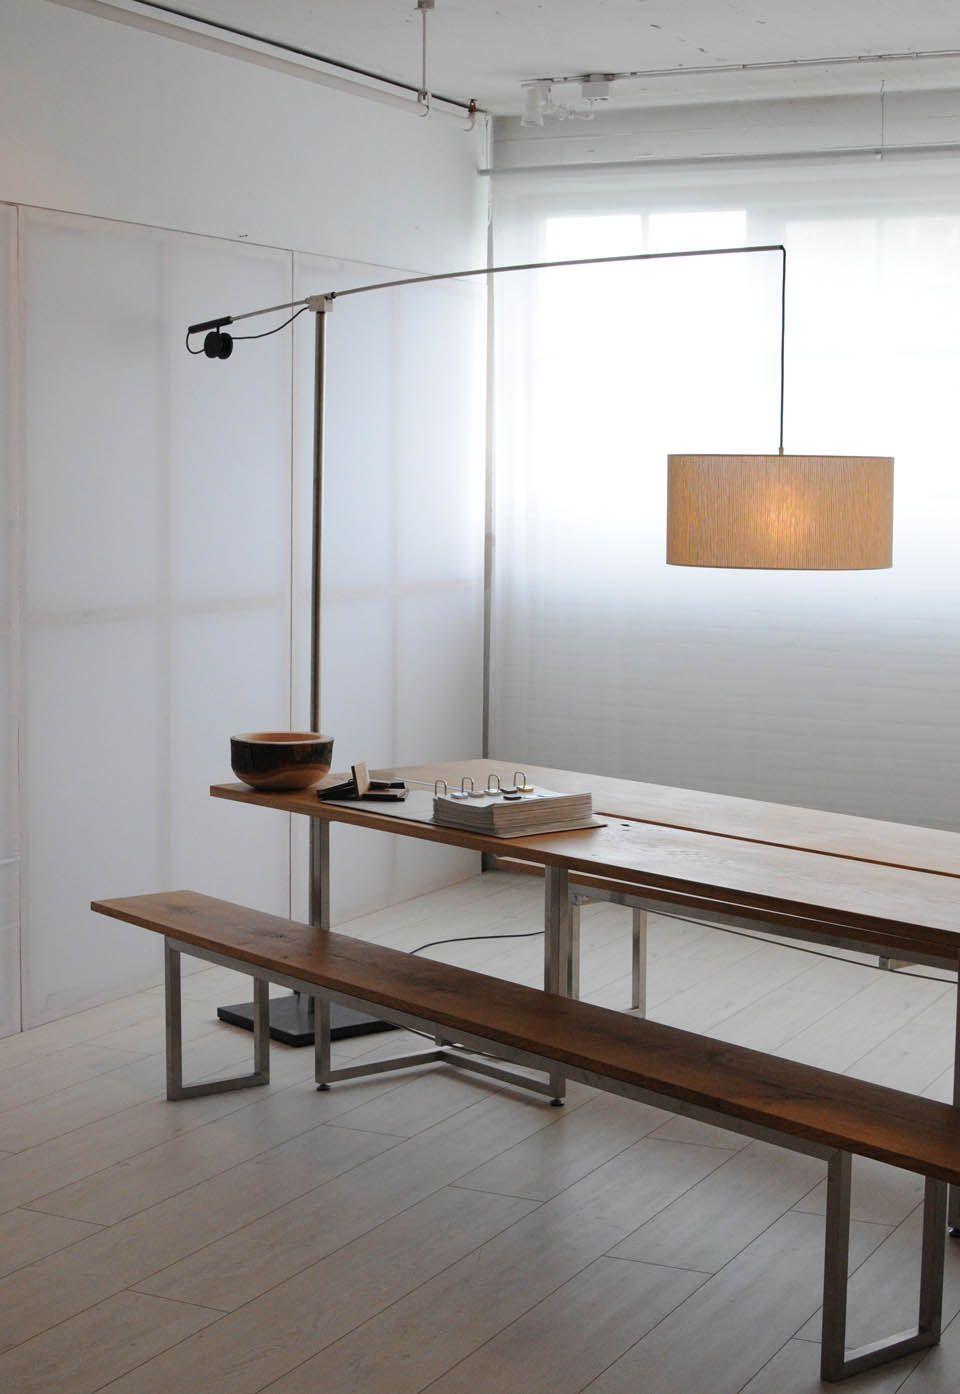 Ghyczy Vloerlamp MW22 & tafel T3456 - Ghyczy Te zien én te koop bij ...